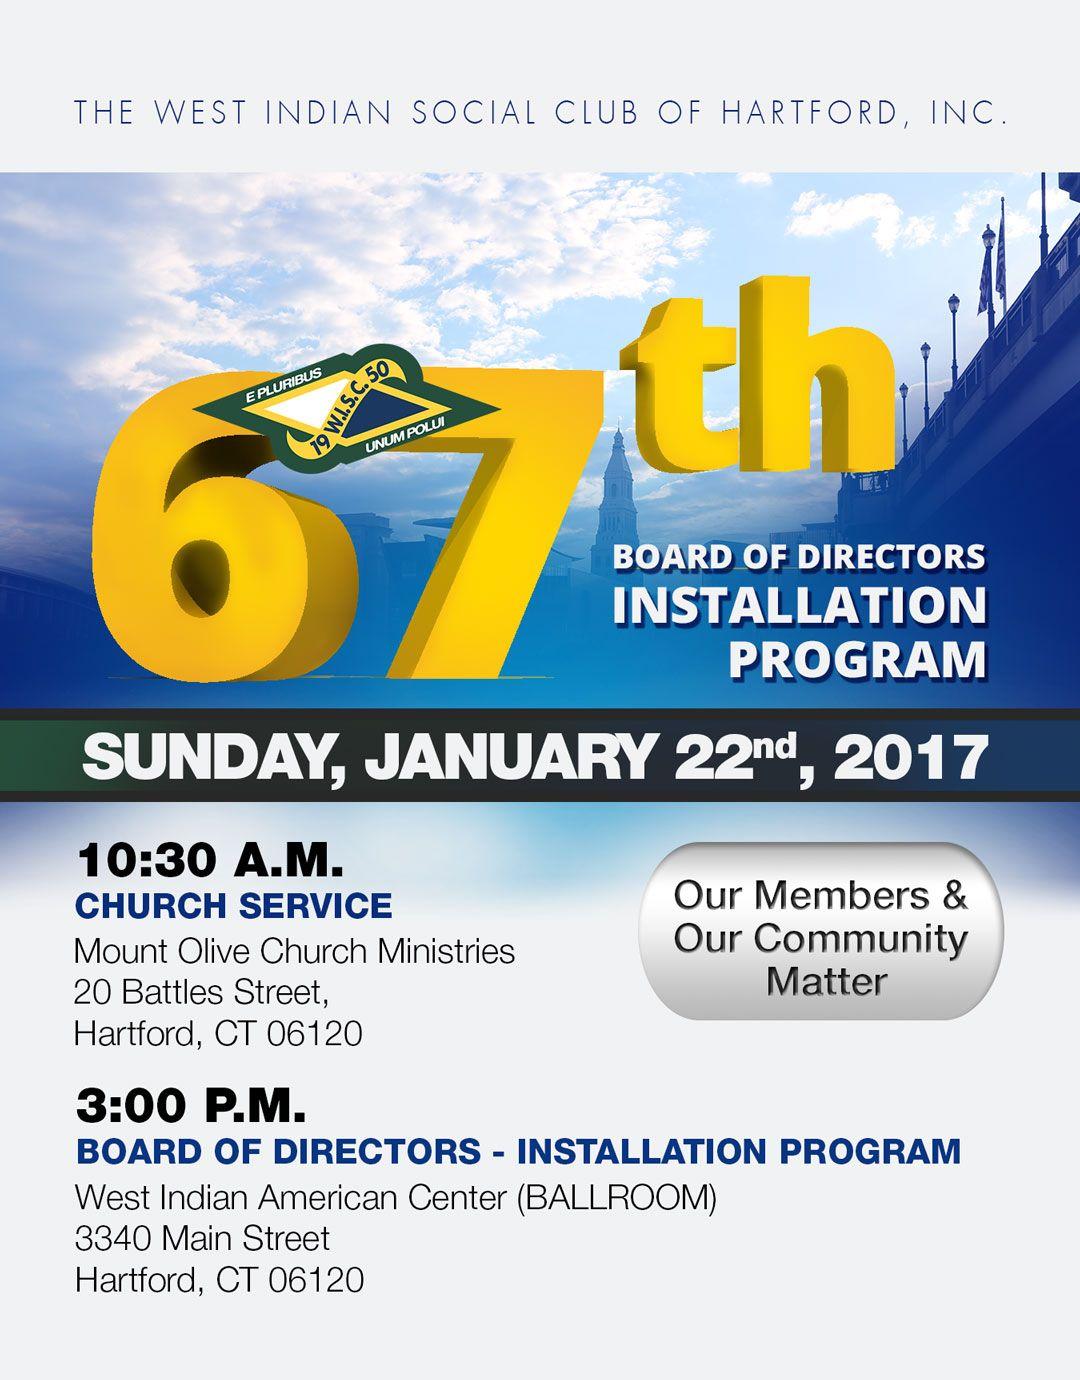 West Indian Social Club's - Board of Directors - Installation PROGRAM